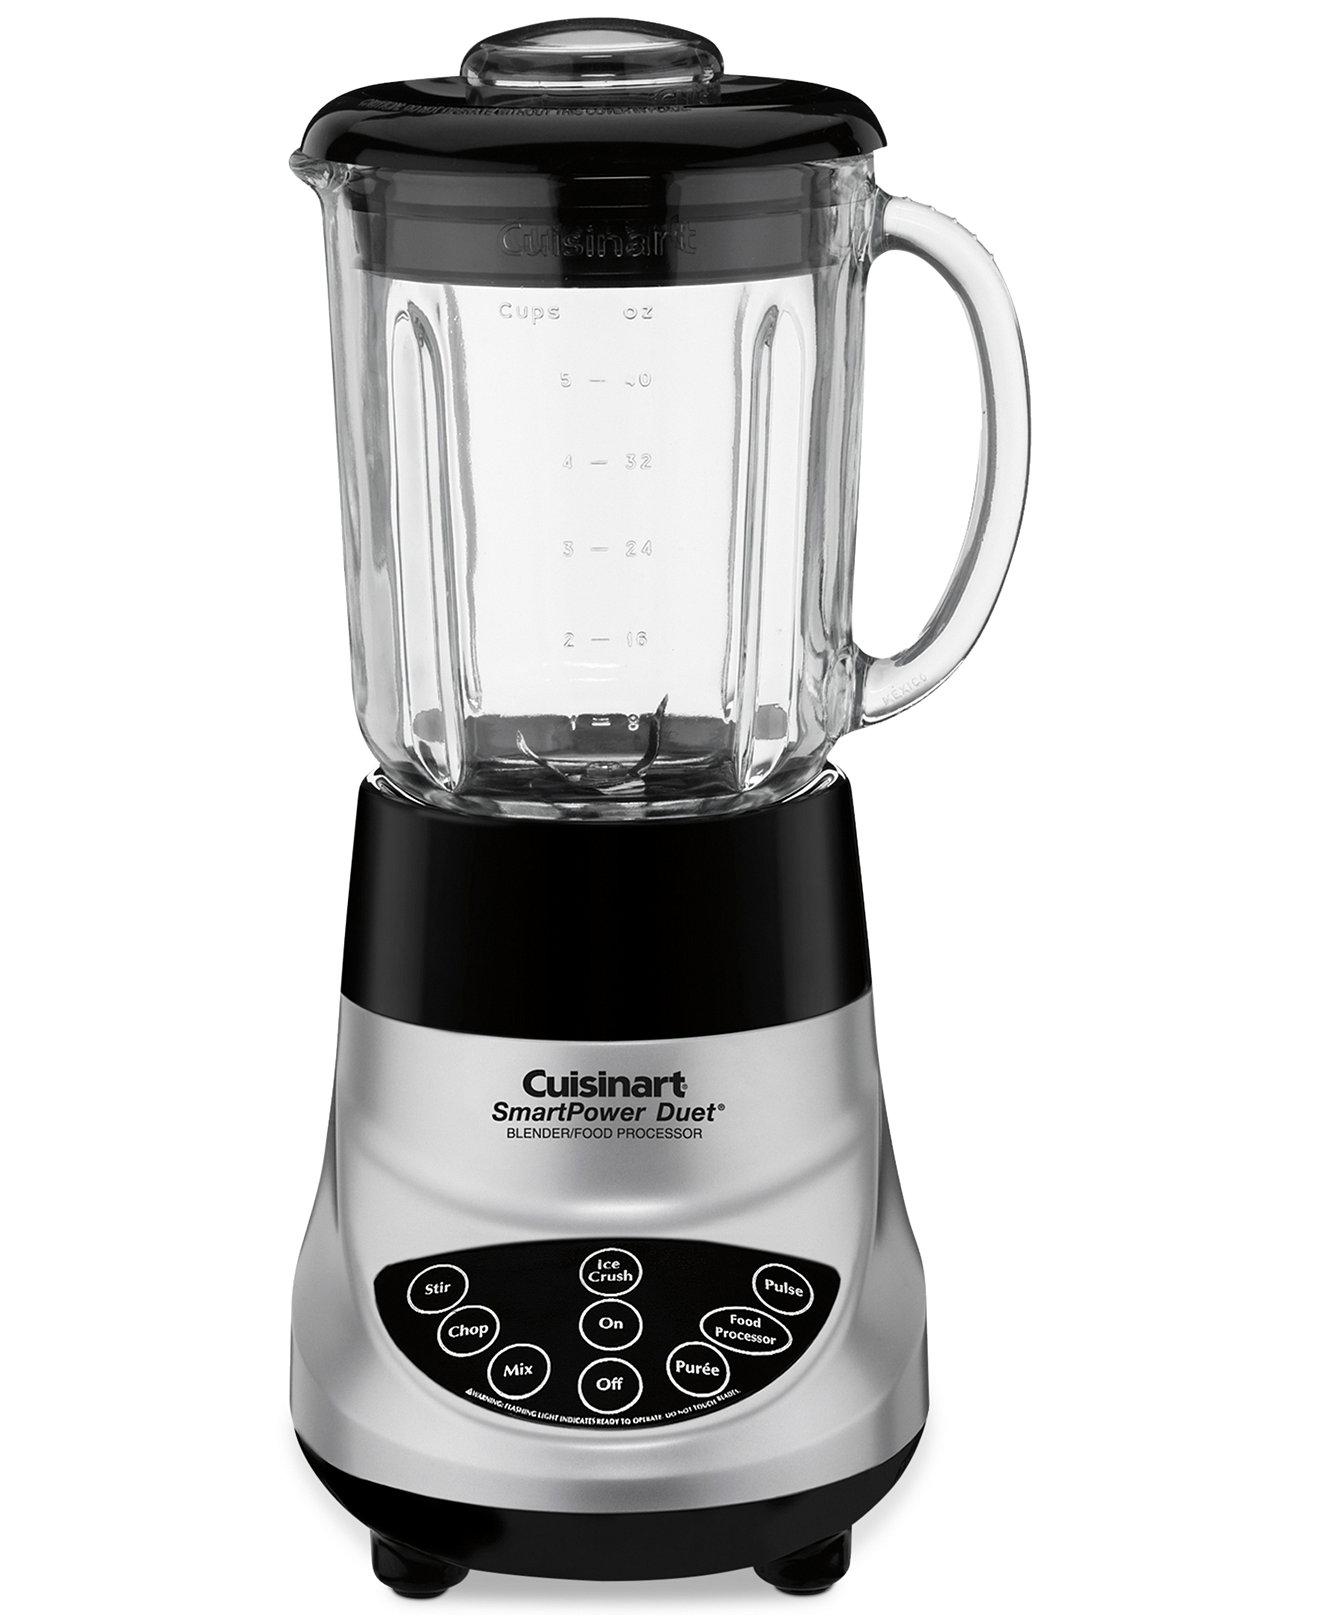 Macys Kitchen Appliances Cuisinart Bfp 703bc Blender Food Processor Duet Combination